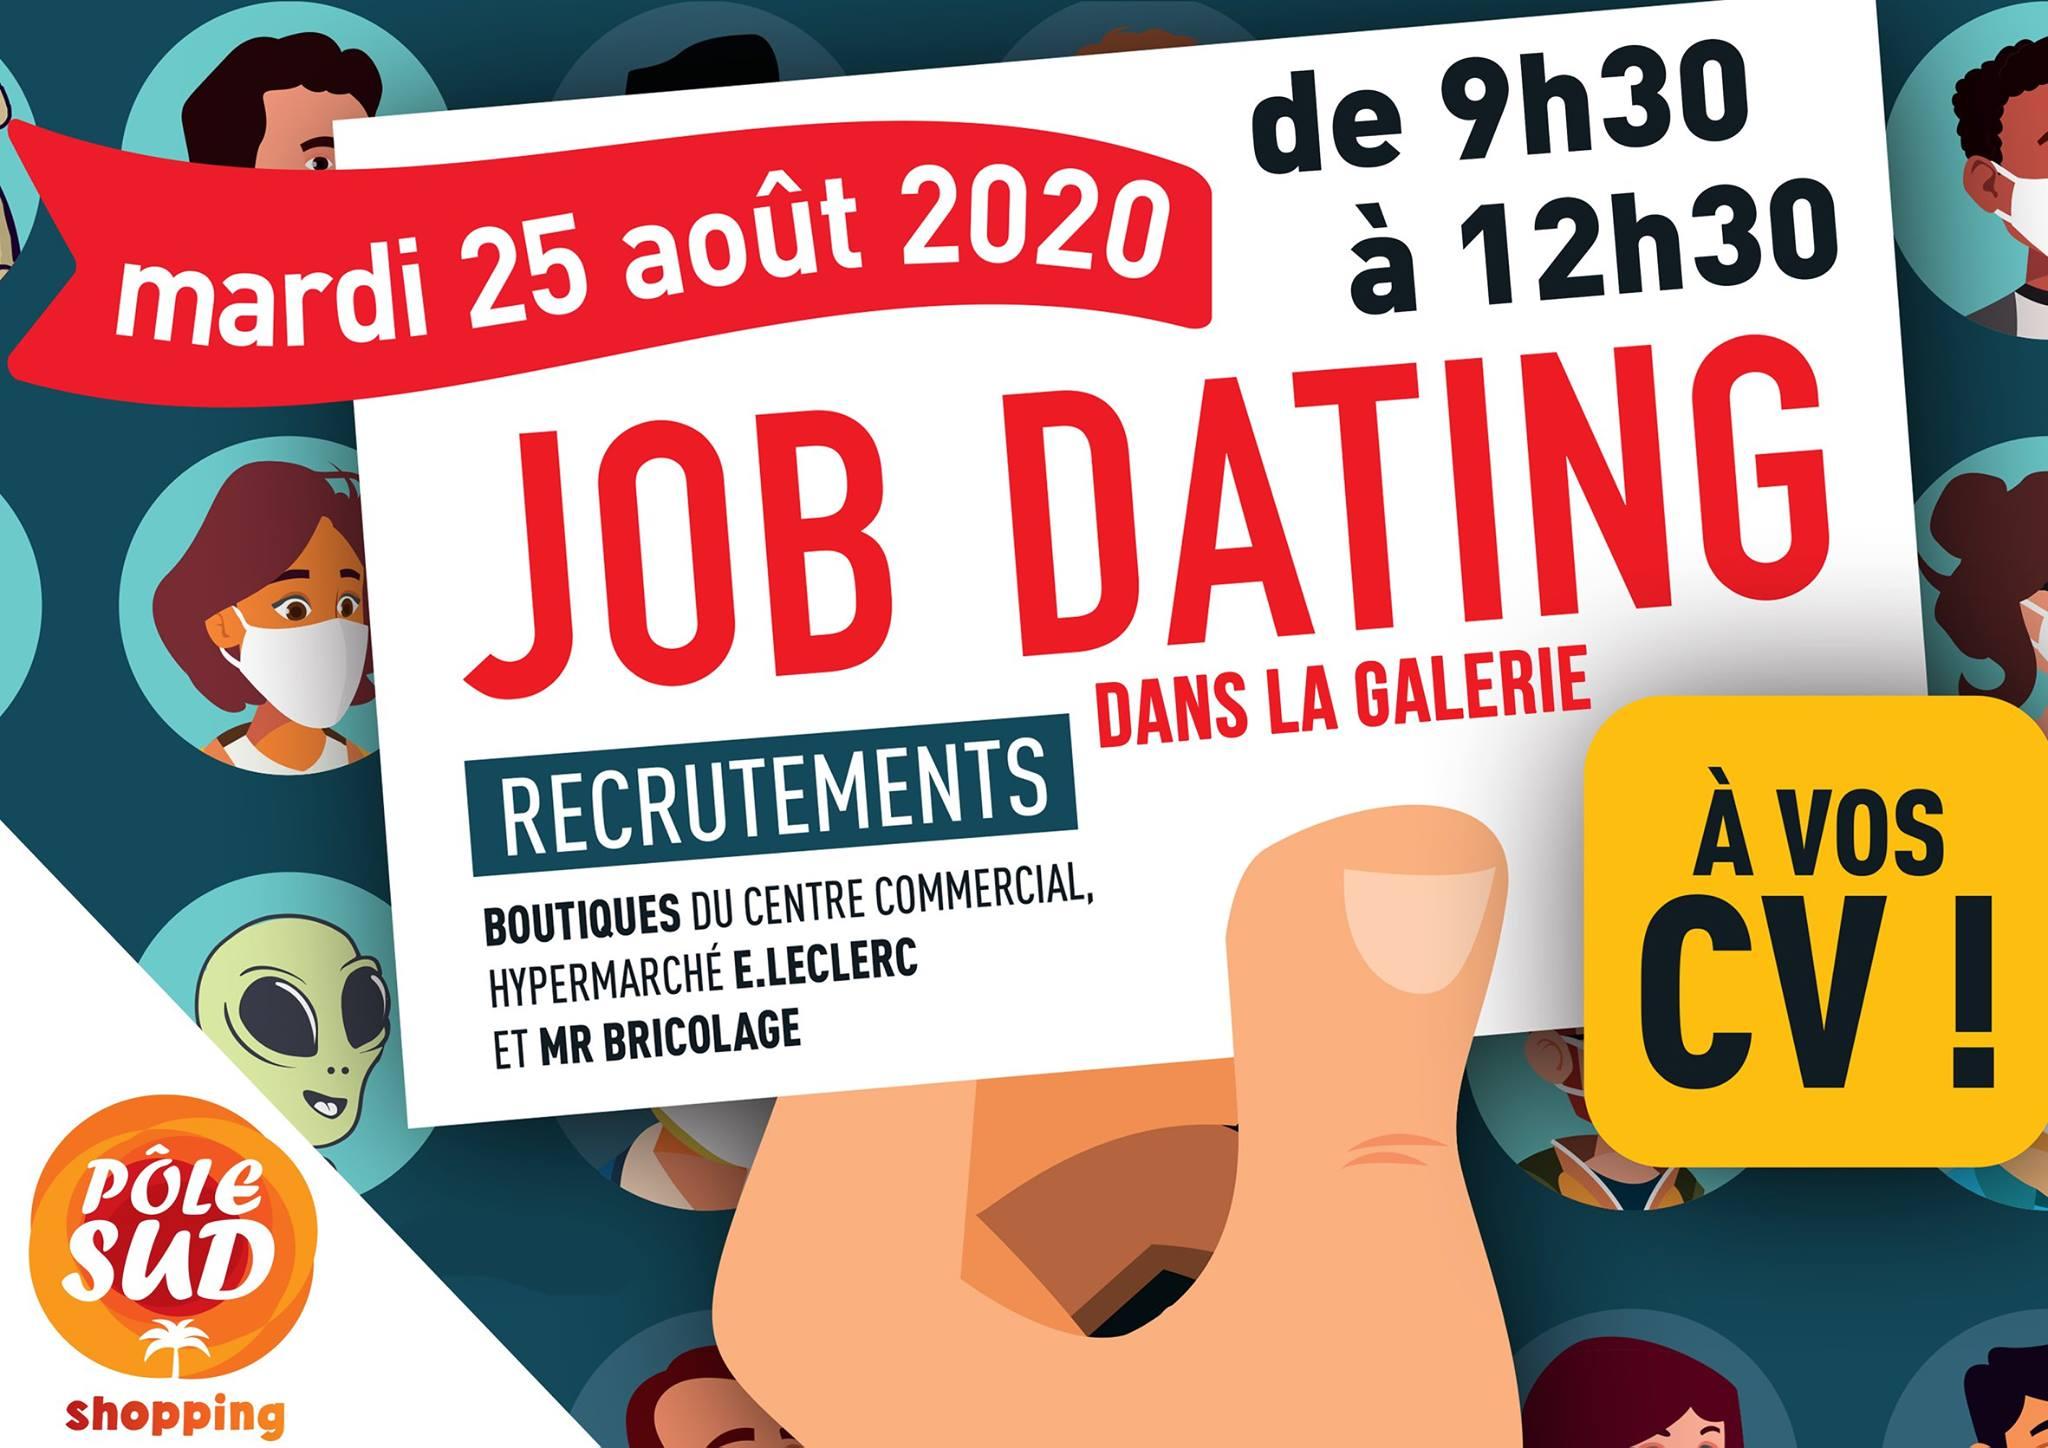 job dating pole sud